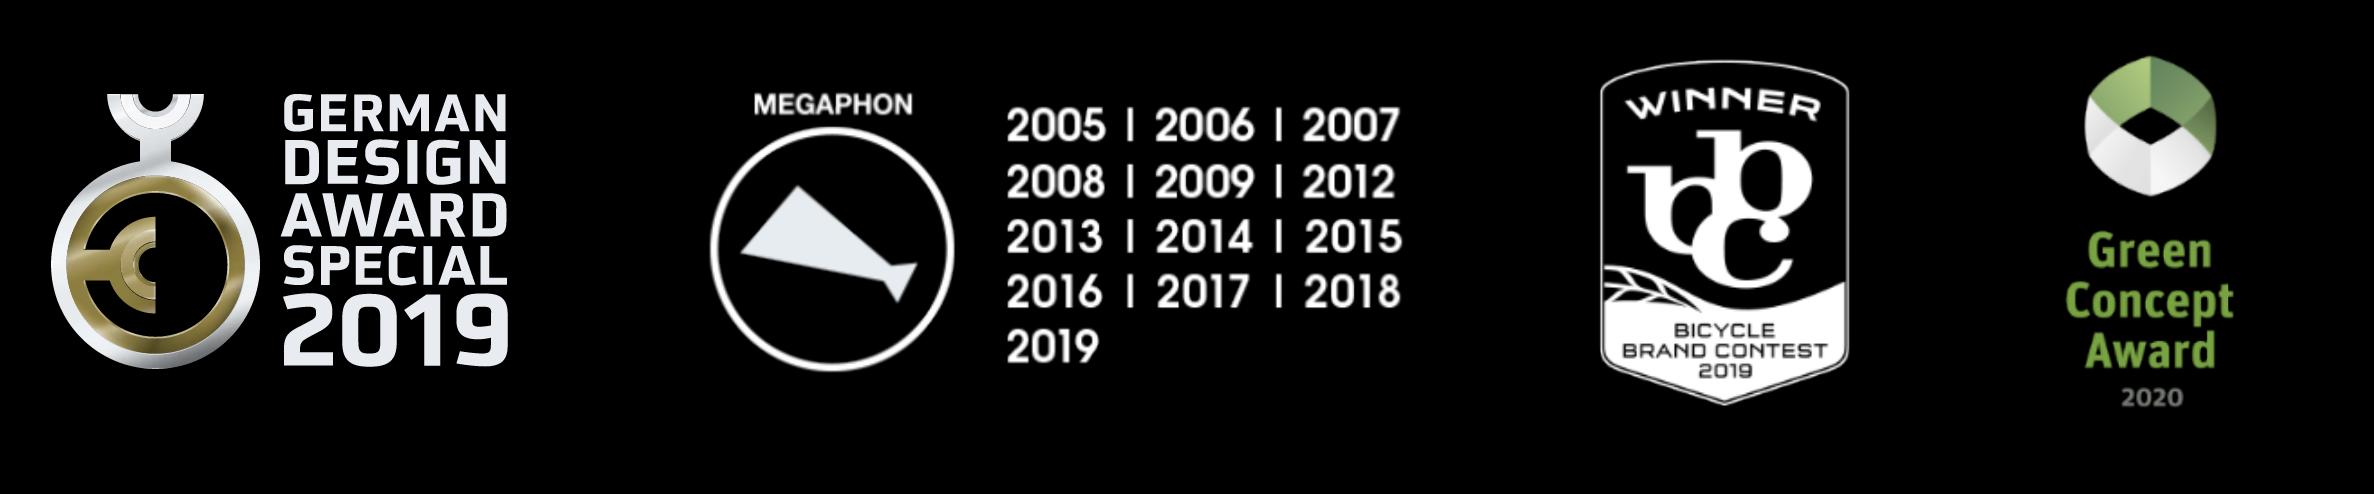 German Design Award 2019, Megaphon Award, Bicycle Brand Contest, Winner 2020